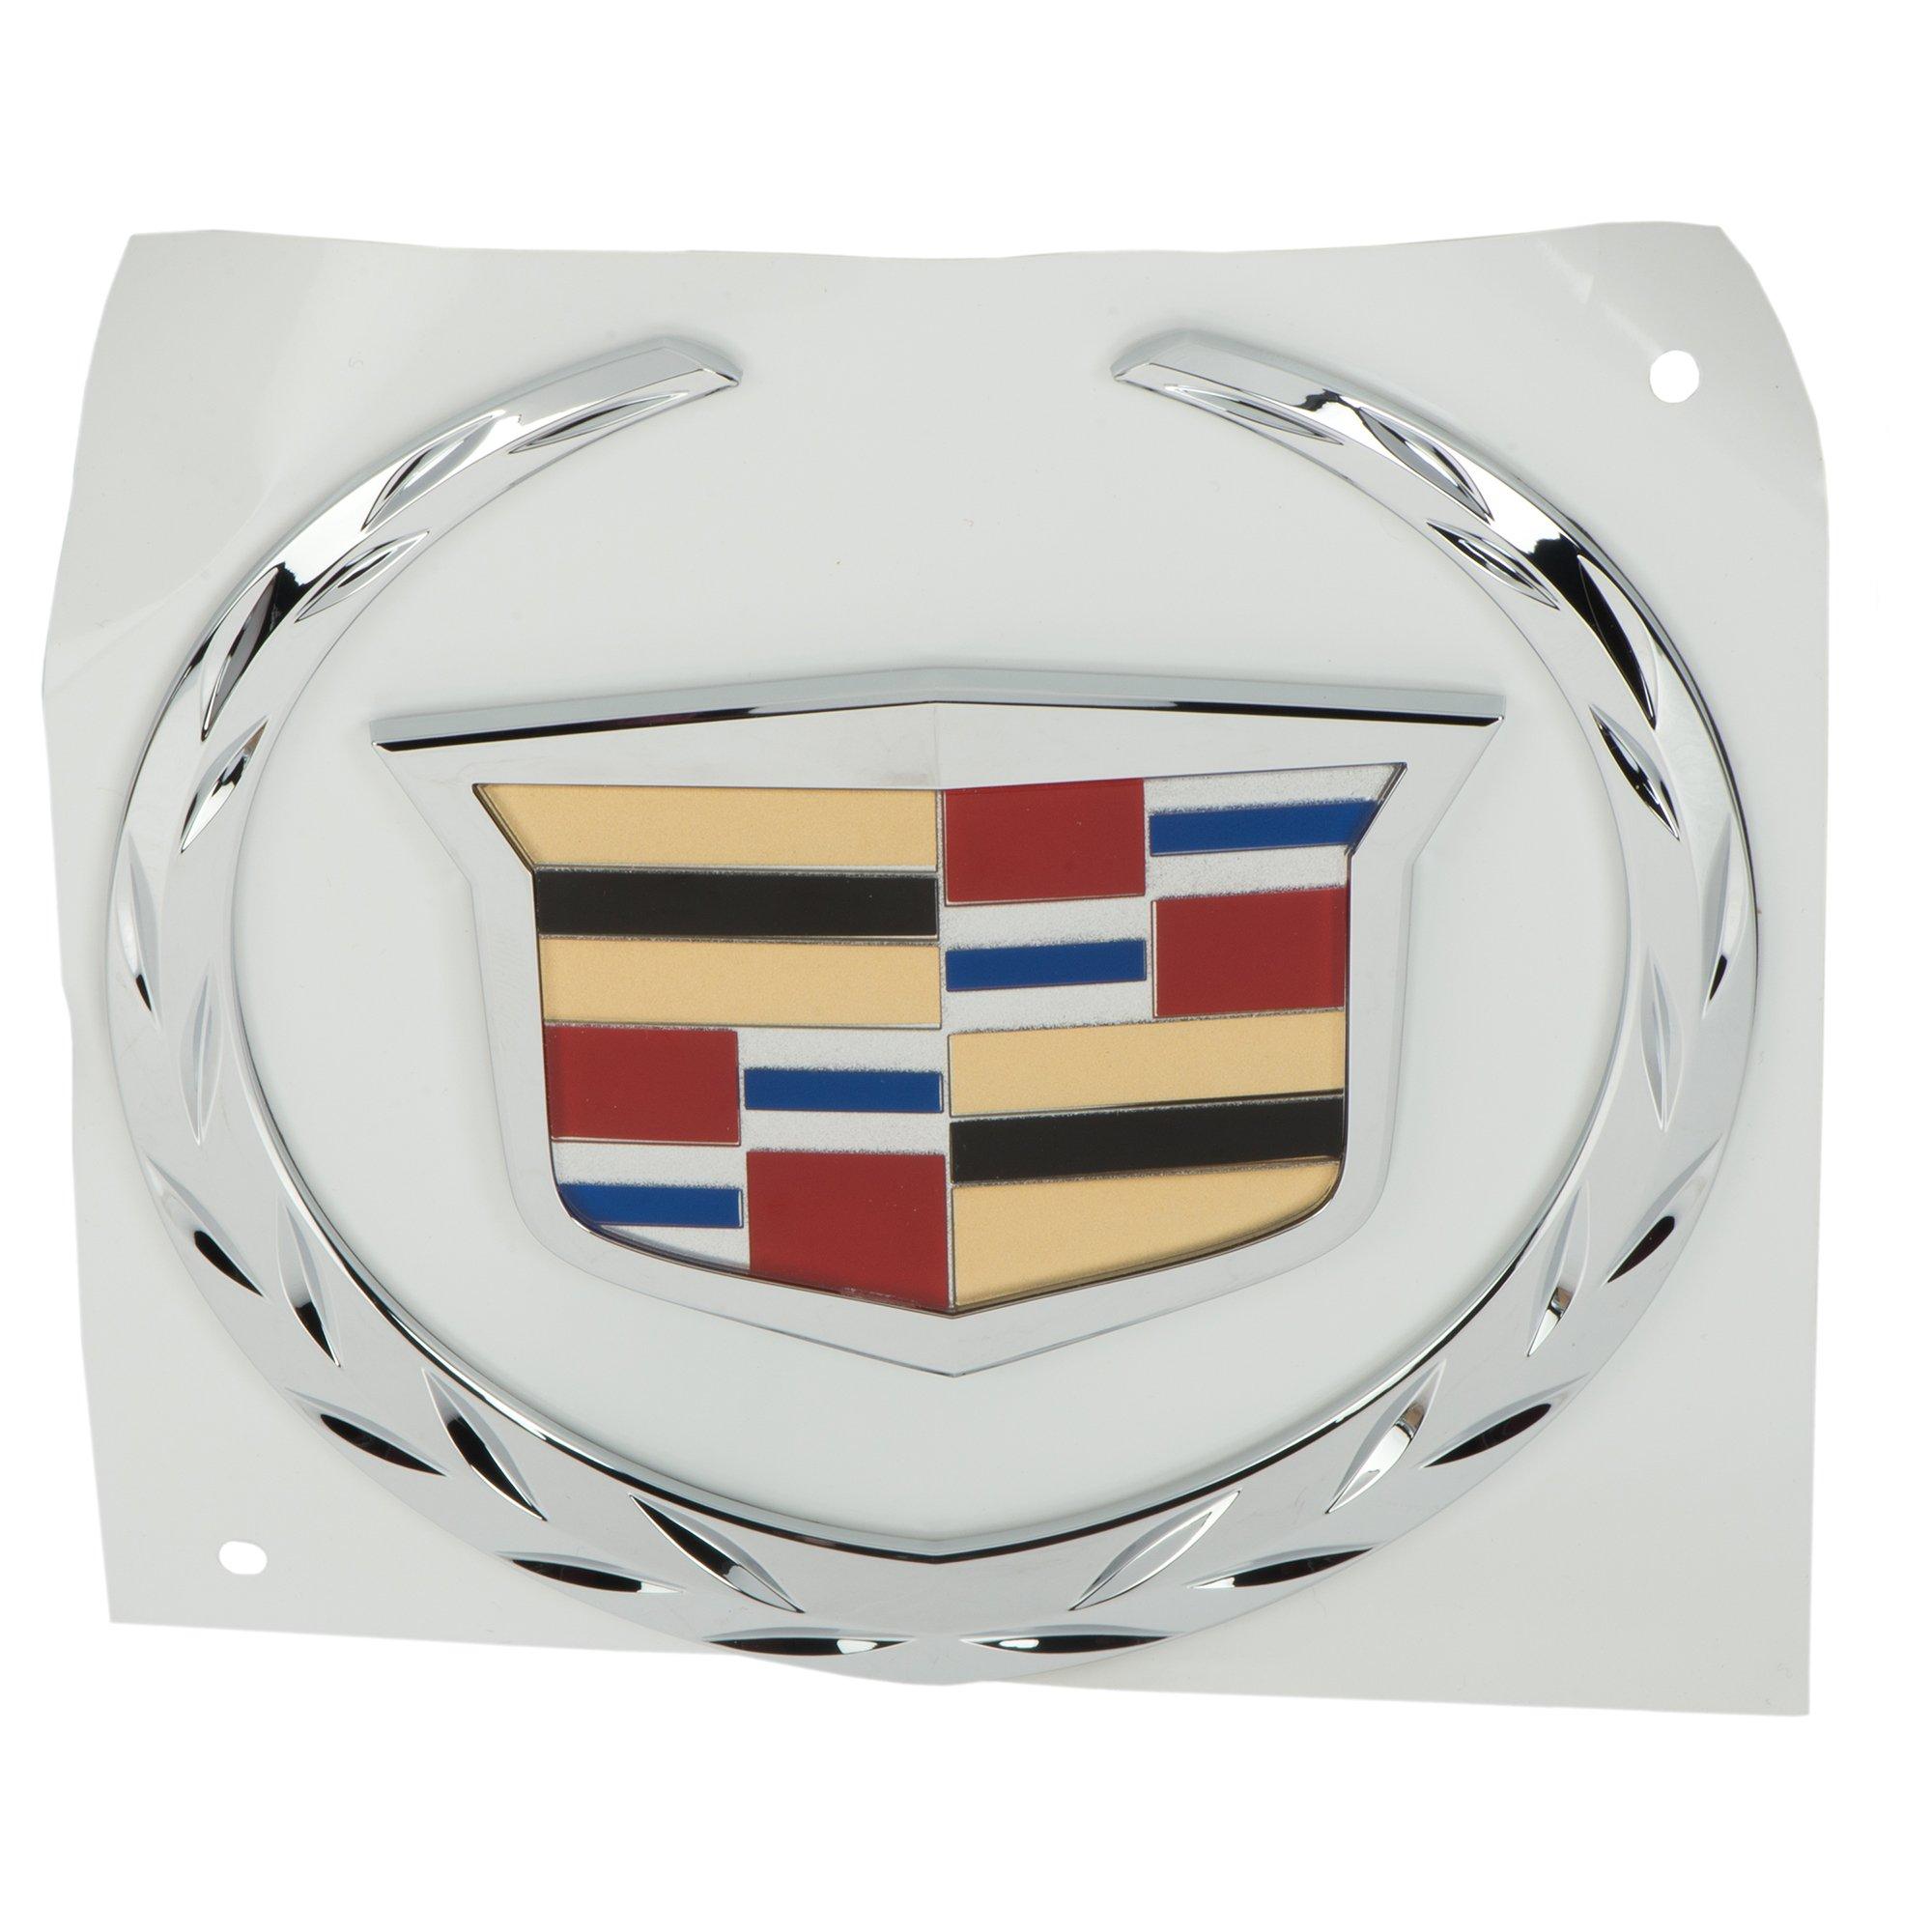 OEM NEW Front Grille Crest & Wreath Emblem Badge 2007-2014 Escalade 22985036